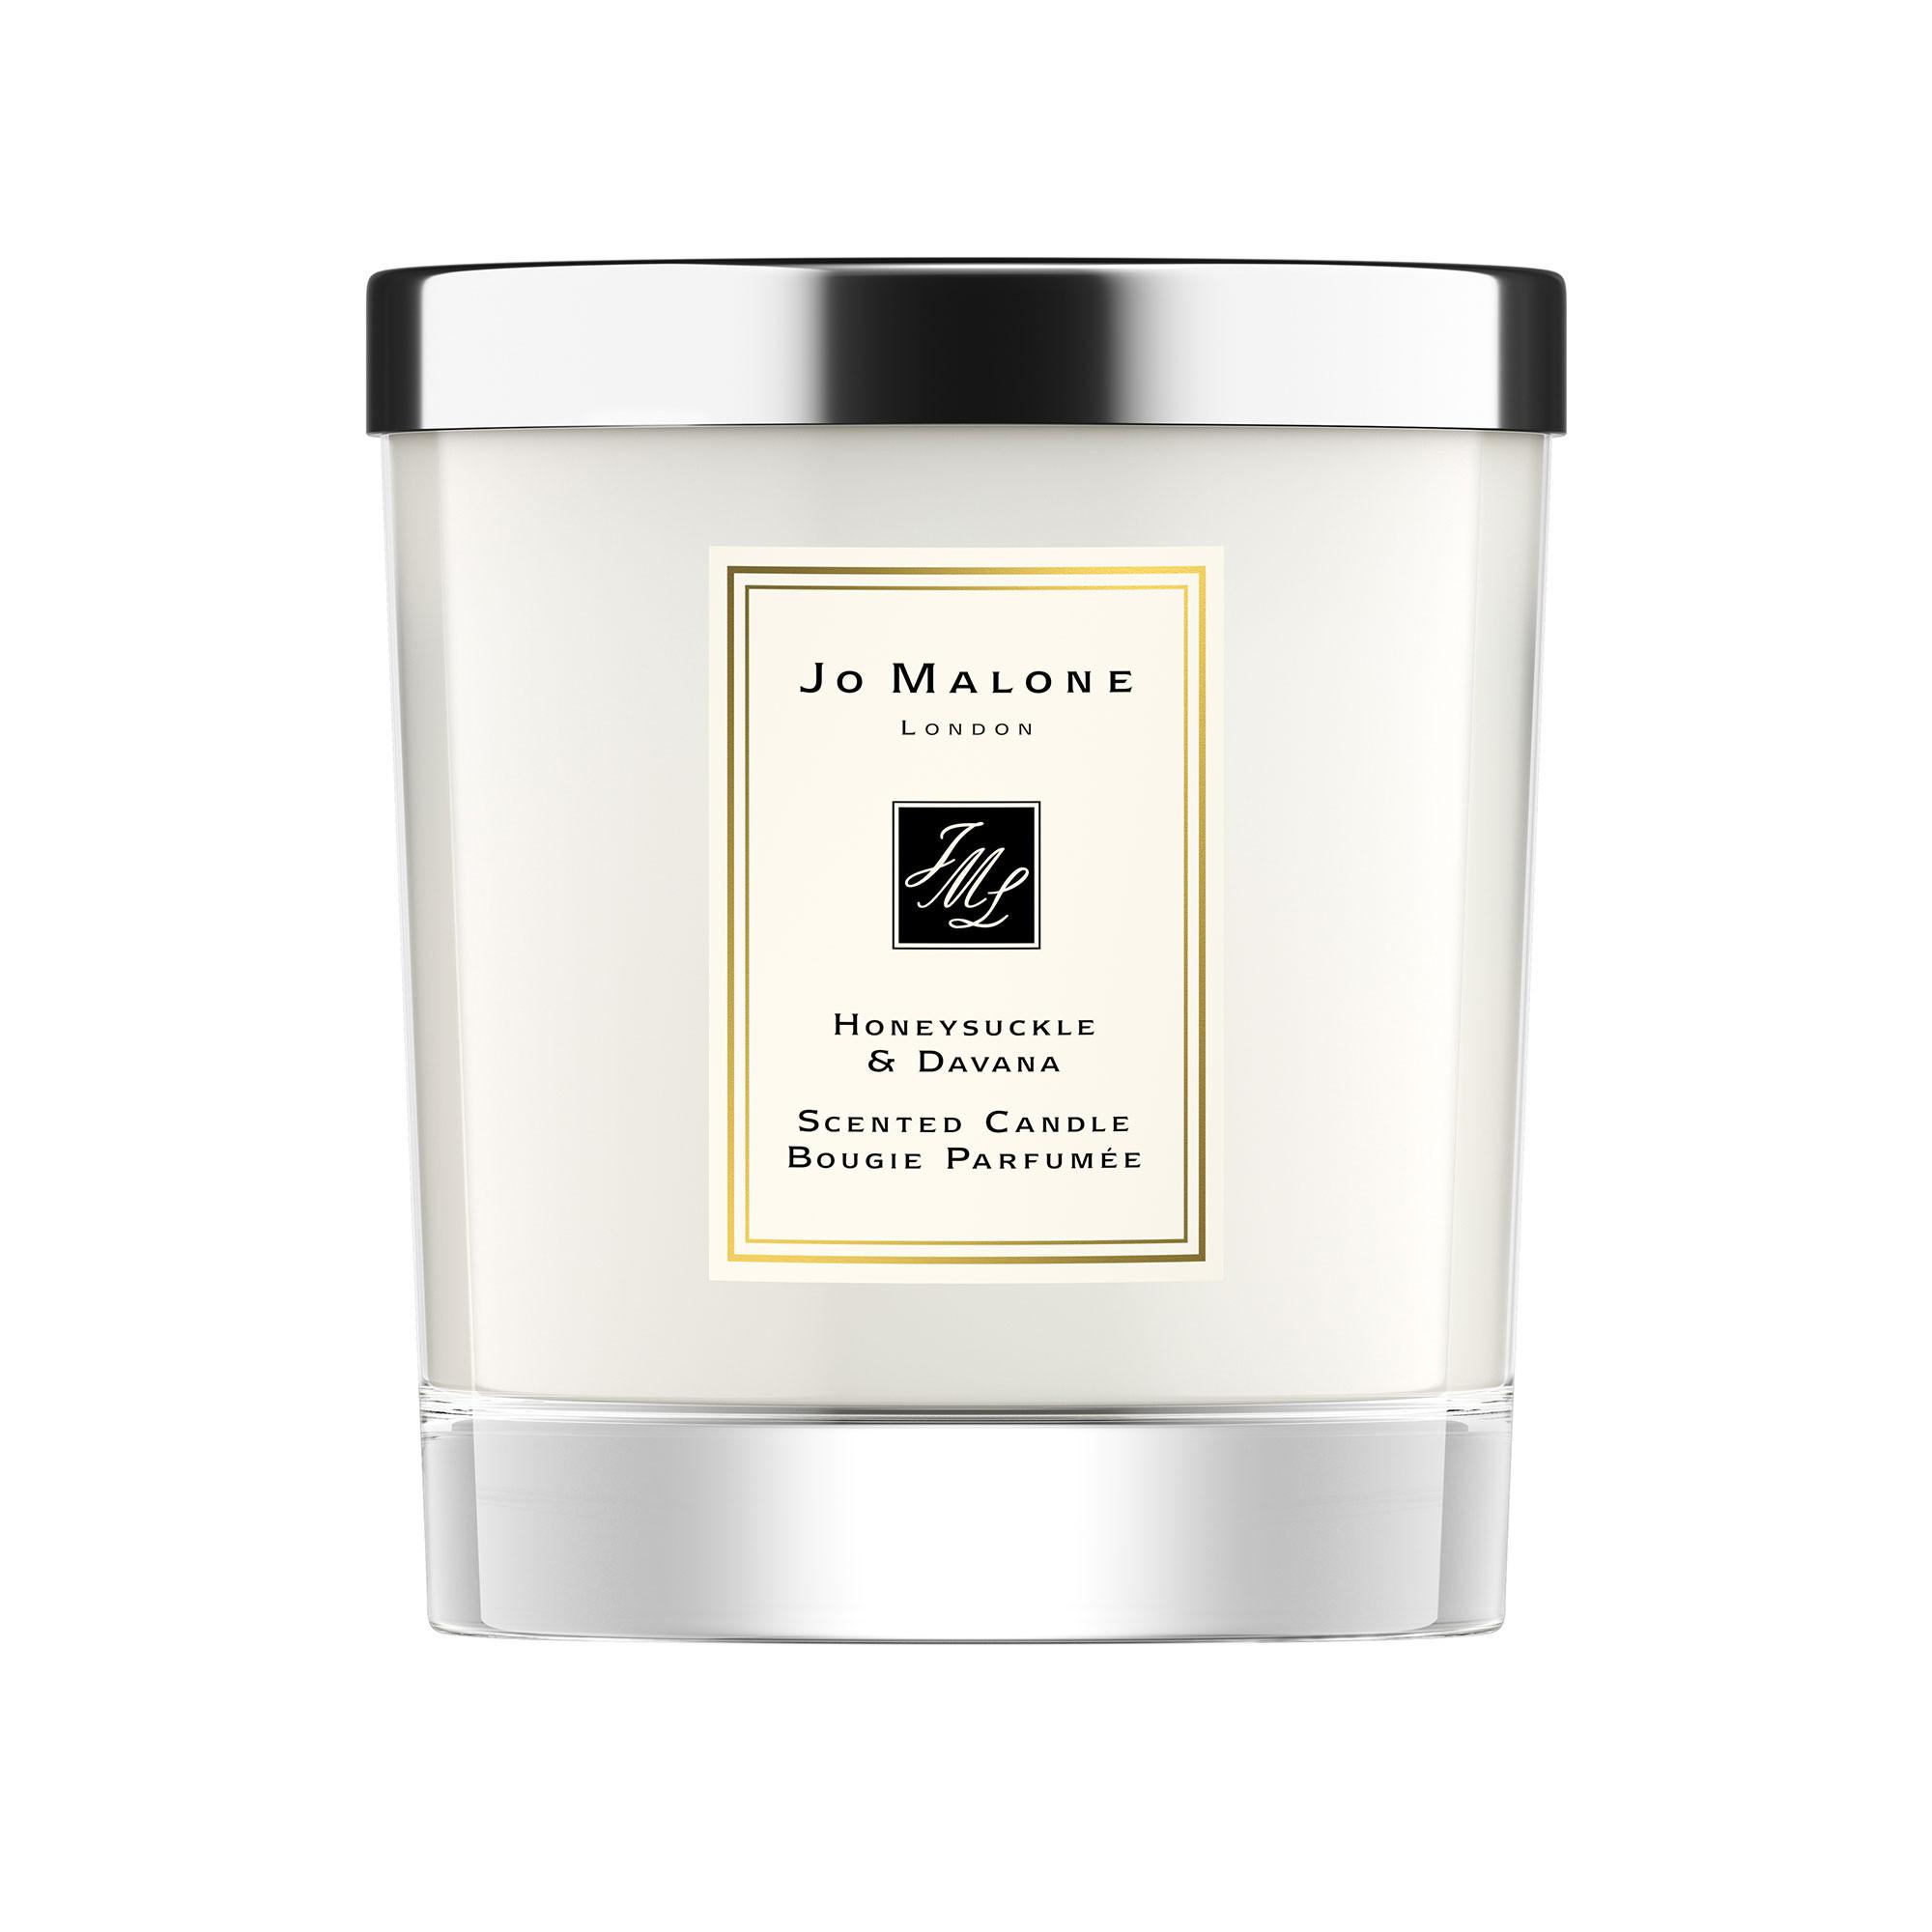 Jo Malone London honeysuckle & davana home candle 200 g, Nero, large image number 0